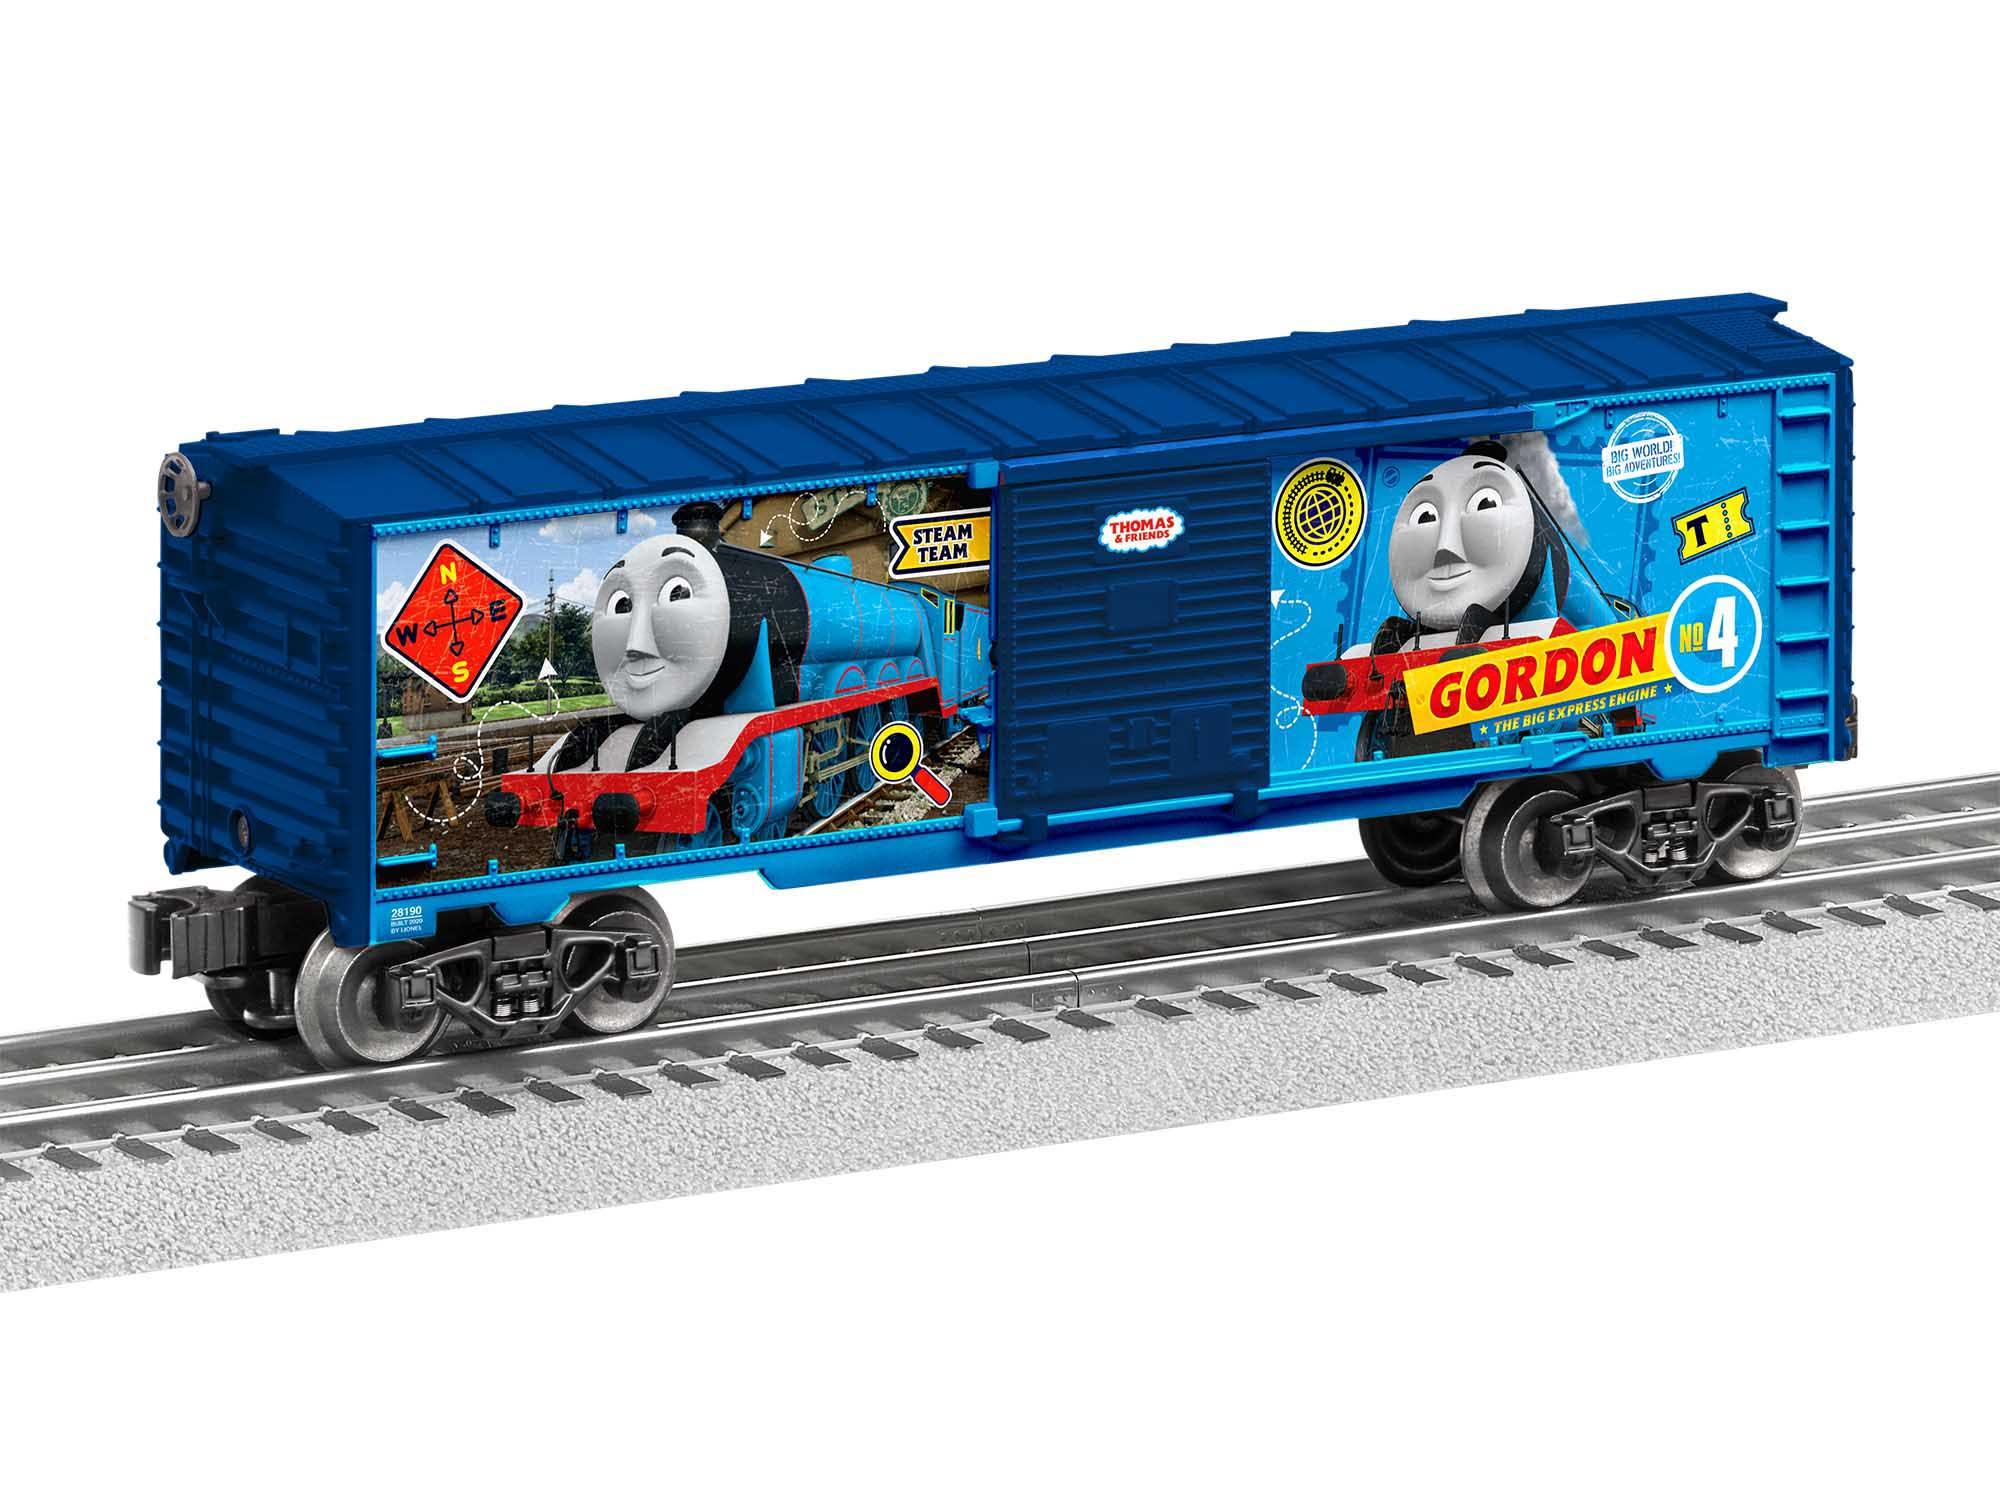 Lionel 2028190 O27 Boxcar Thomas & Friends Gordon